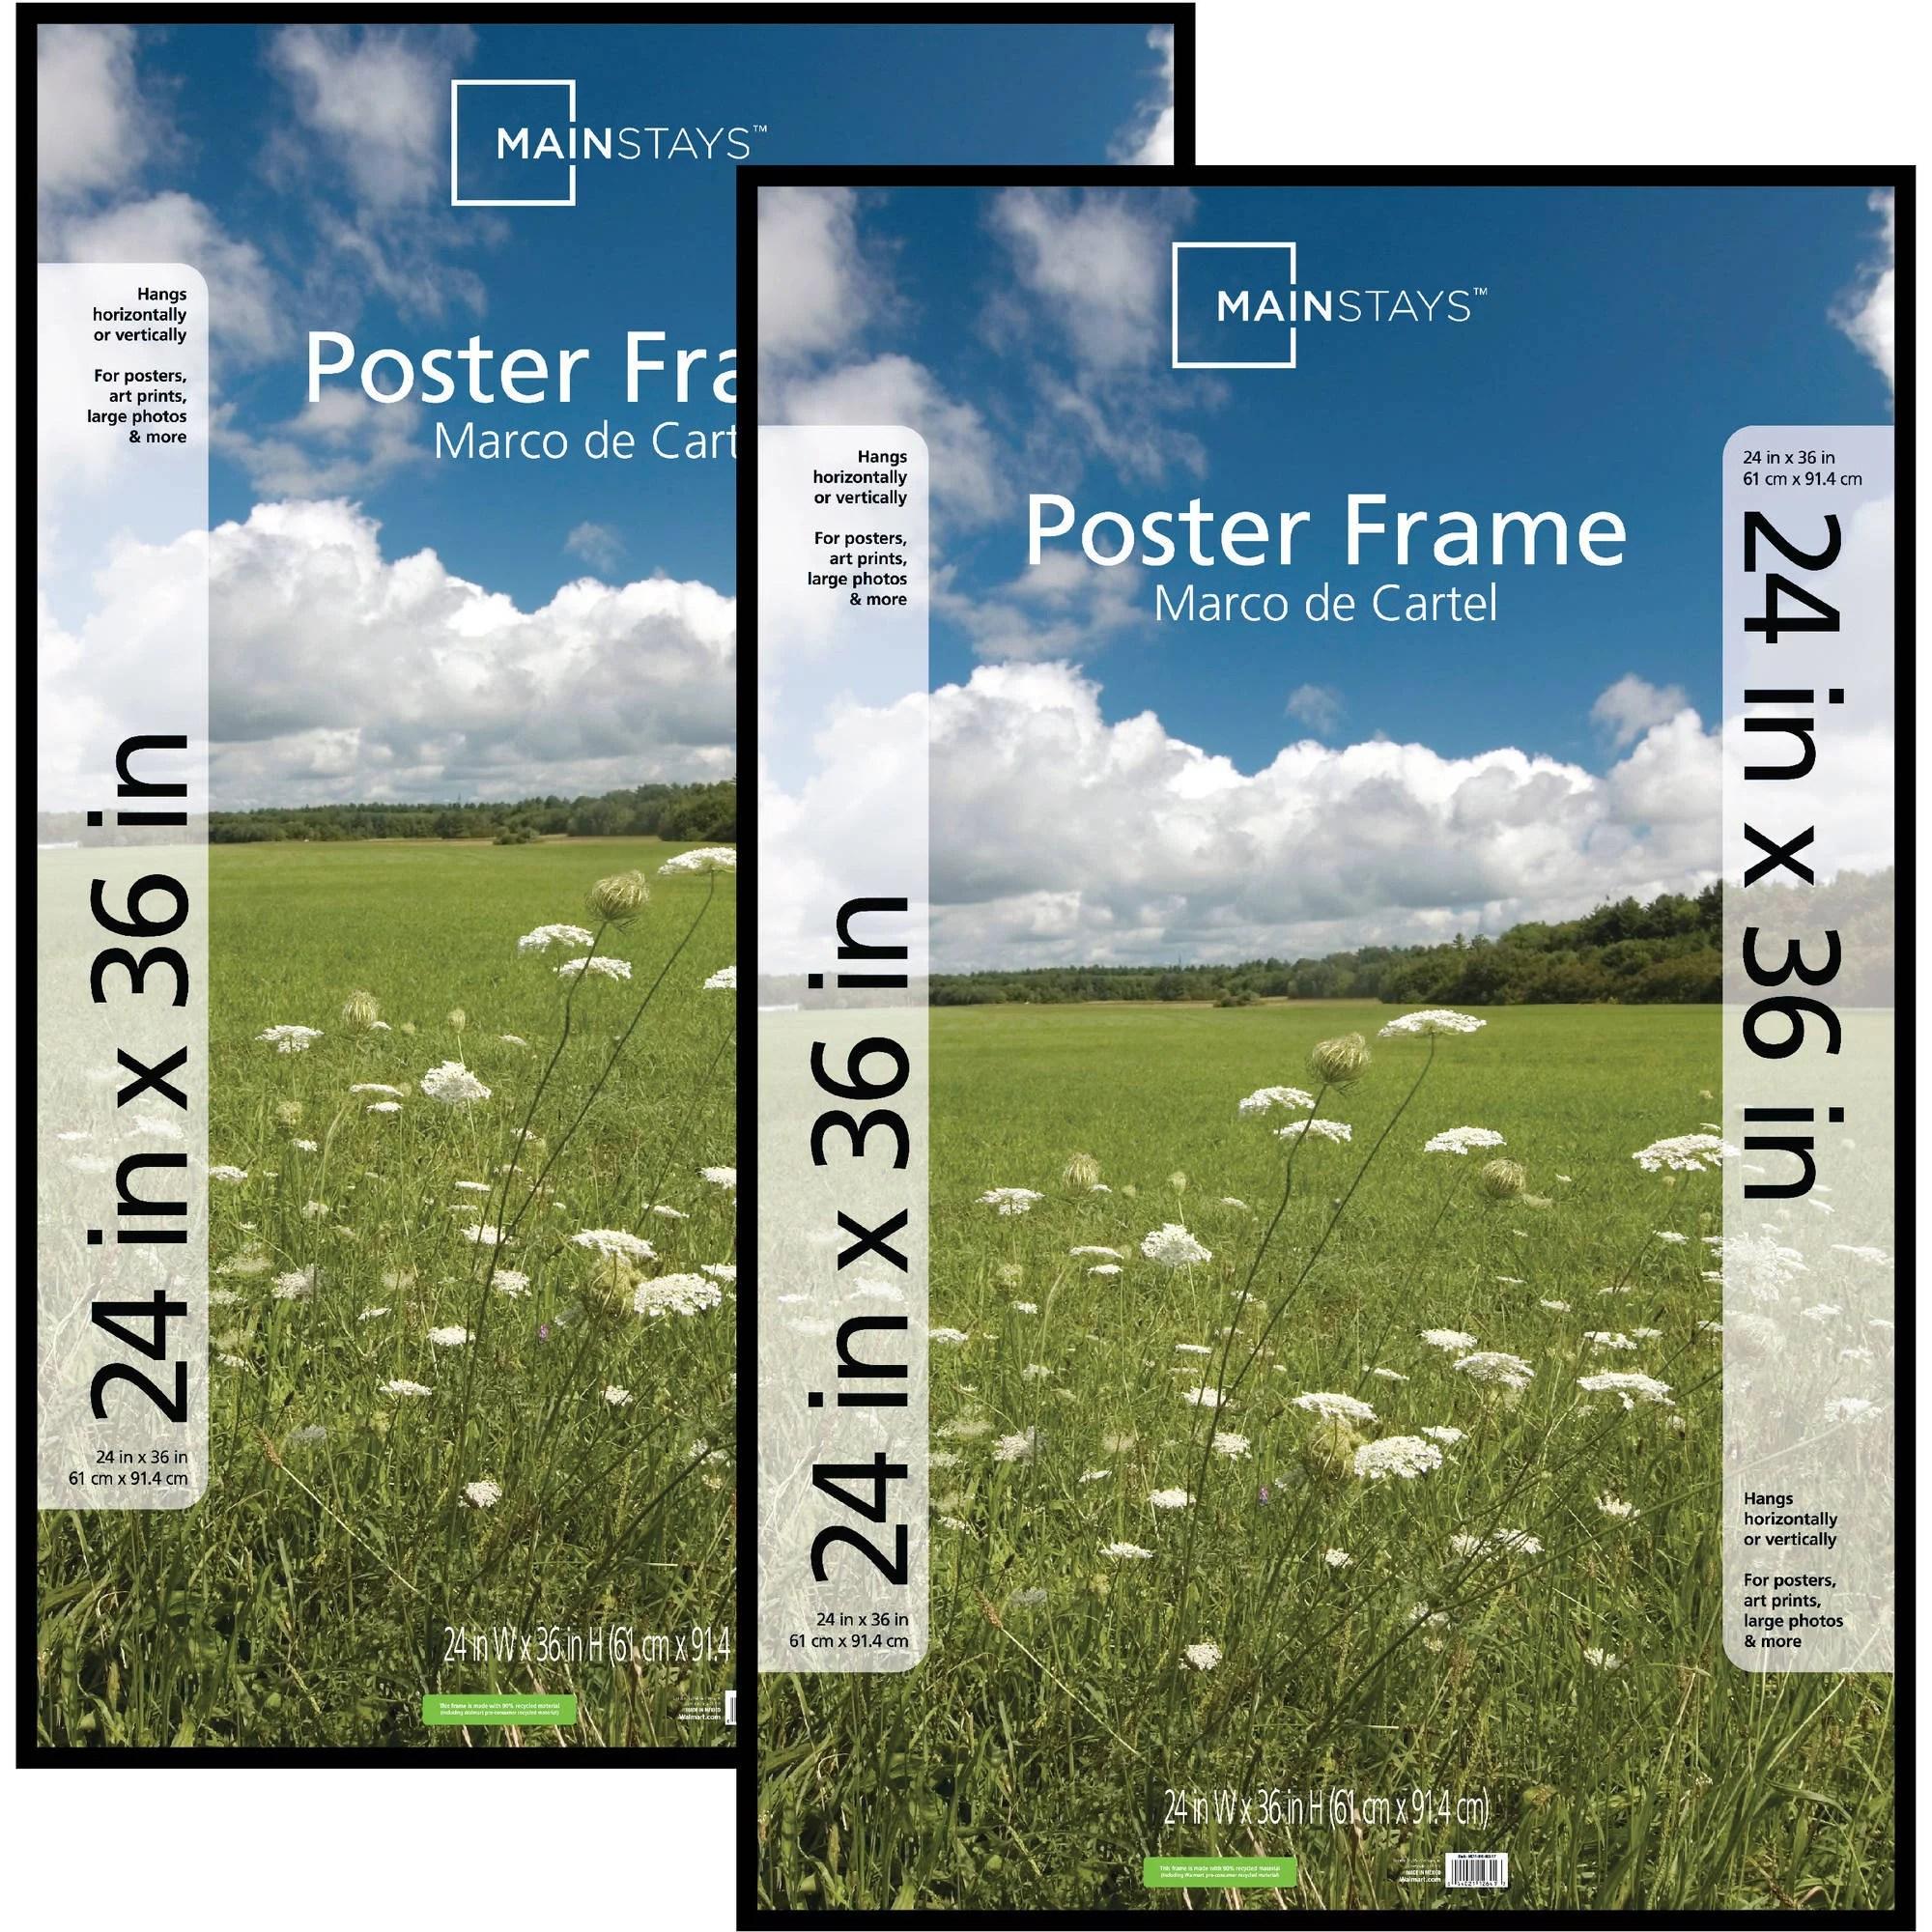 mainstays 24x36 basic poster picture frame black set of 2 walmart com